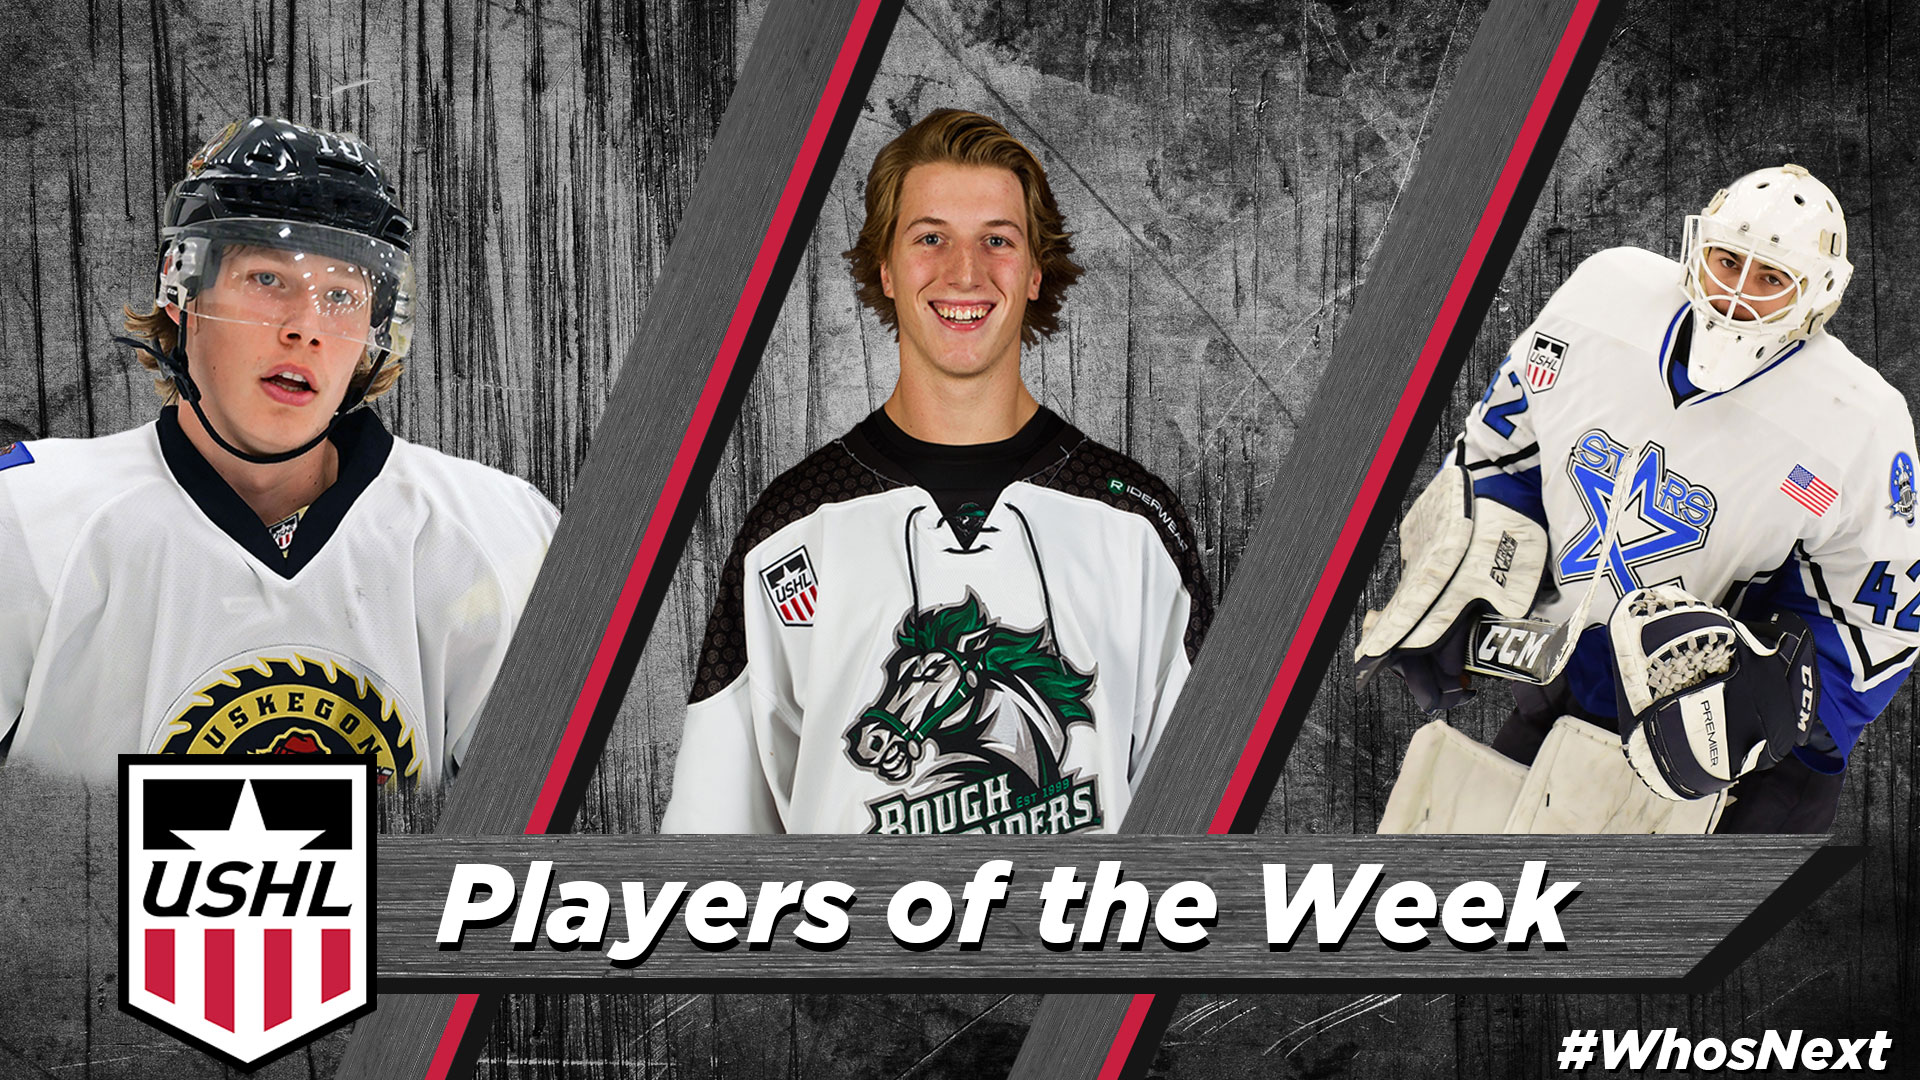 USHL: USHL Players Of The Week - Week 7, 2018-19